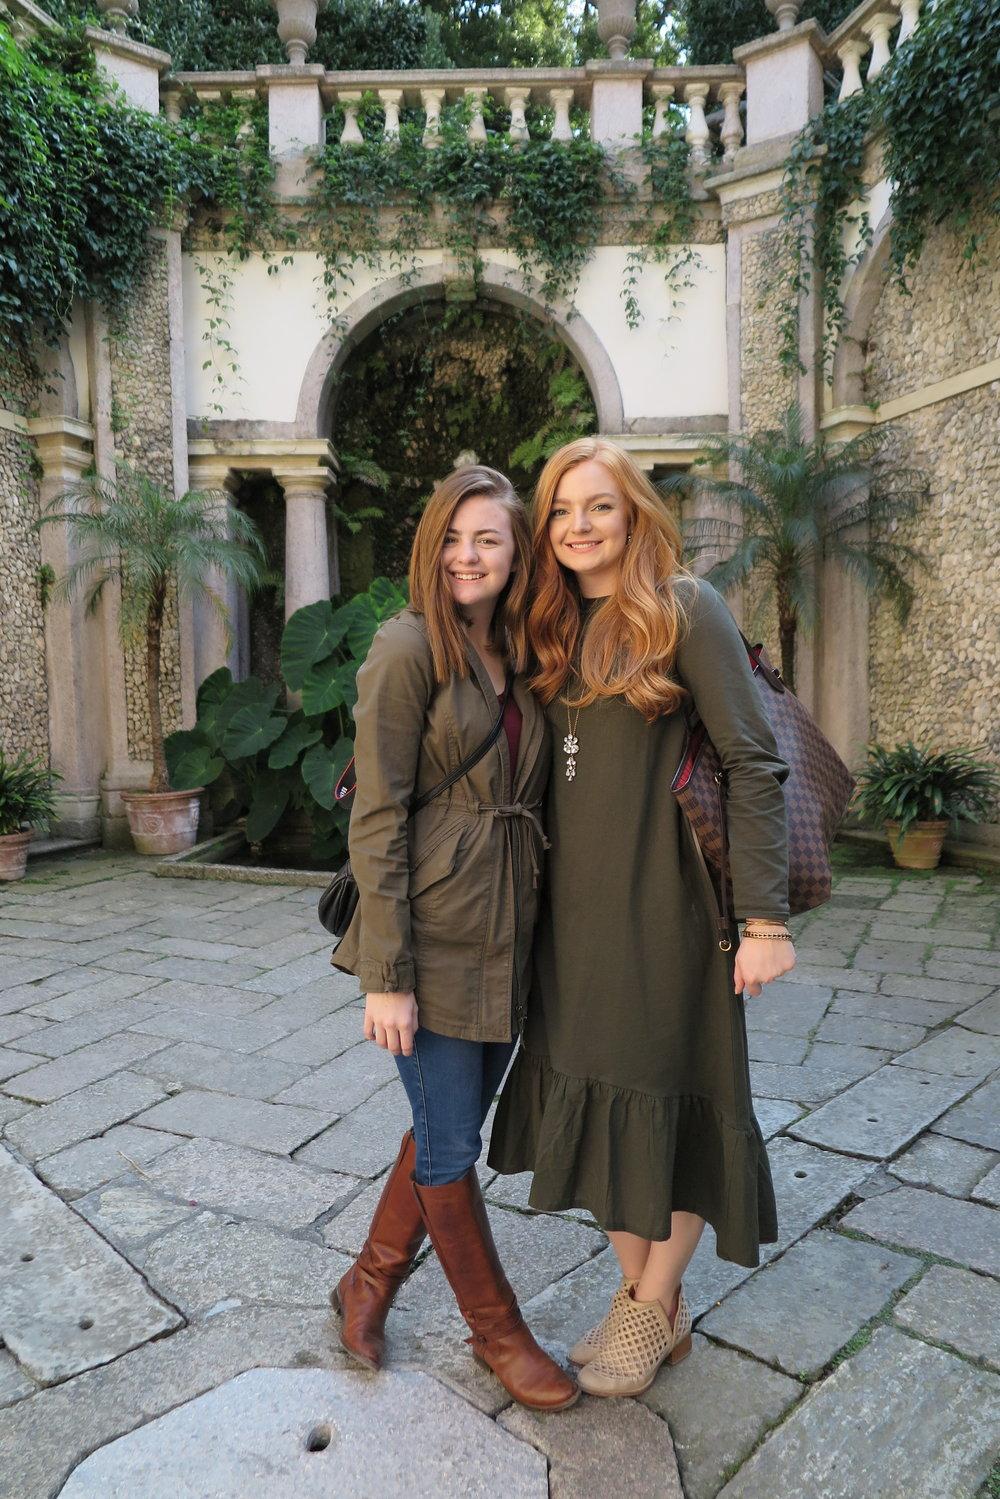 Isola Bella, Stresa, Lake Maggiore, Italy, Samantha McNeil Blog